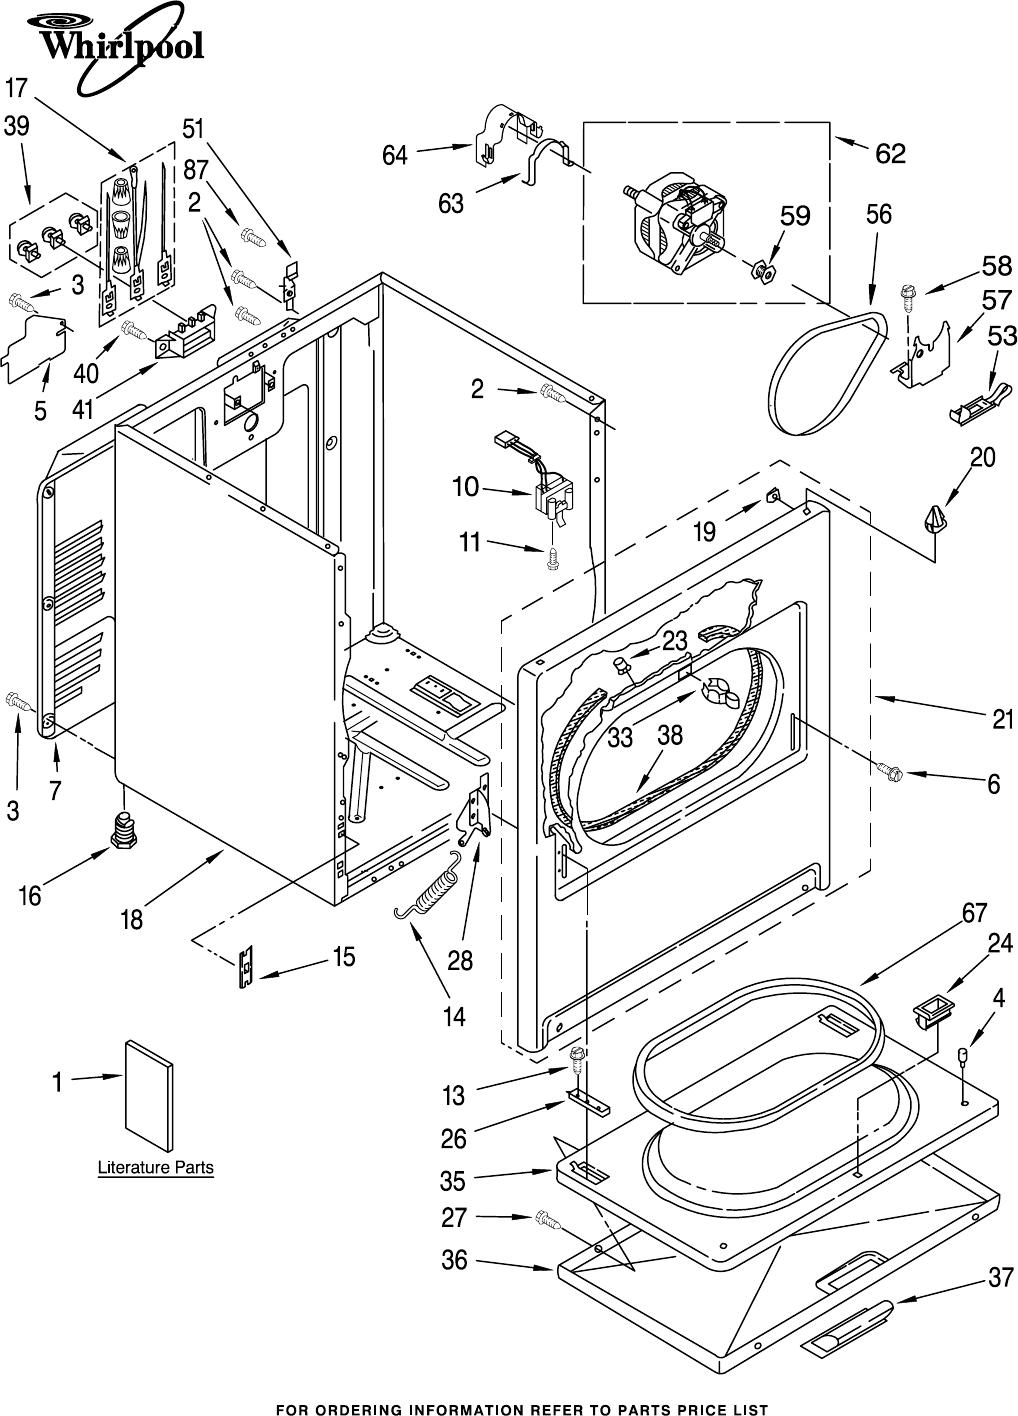 Whirlpool Ler5636Jq0 Users Manual